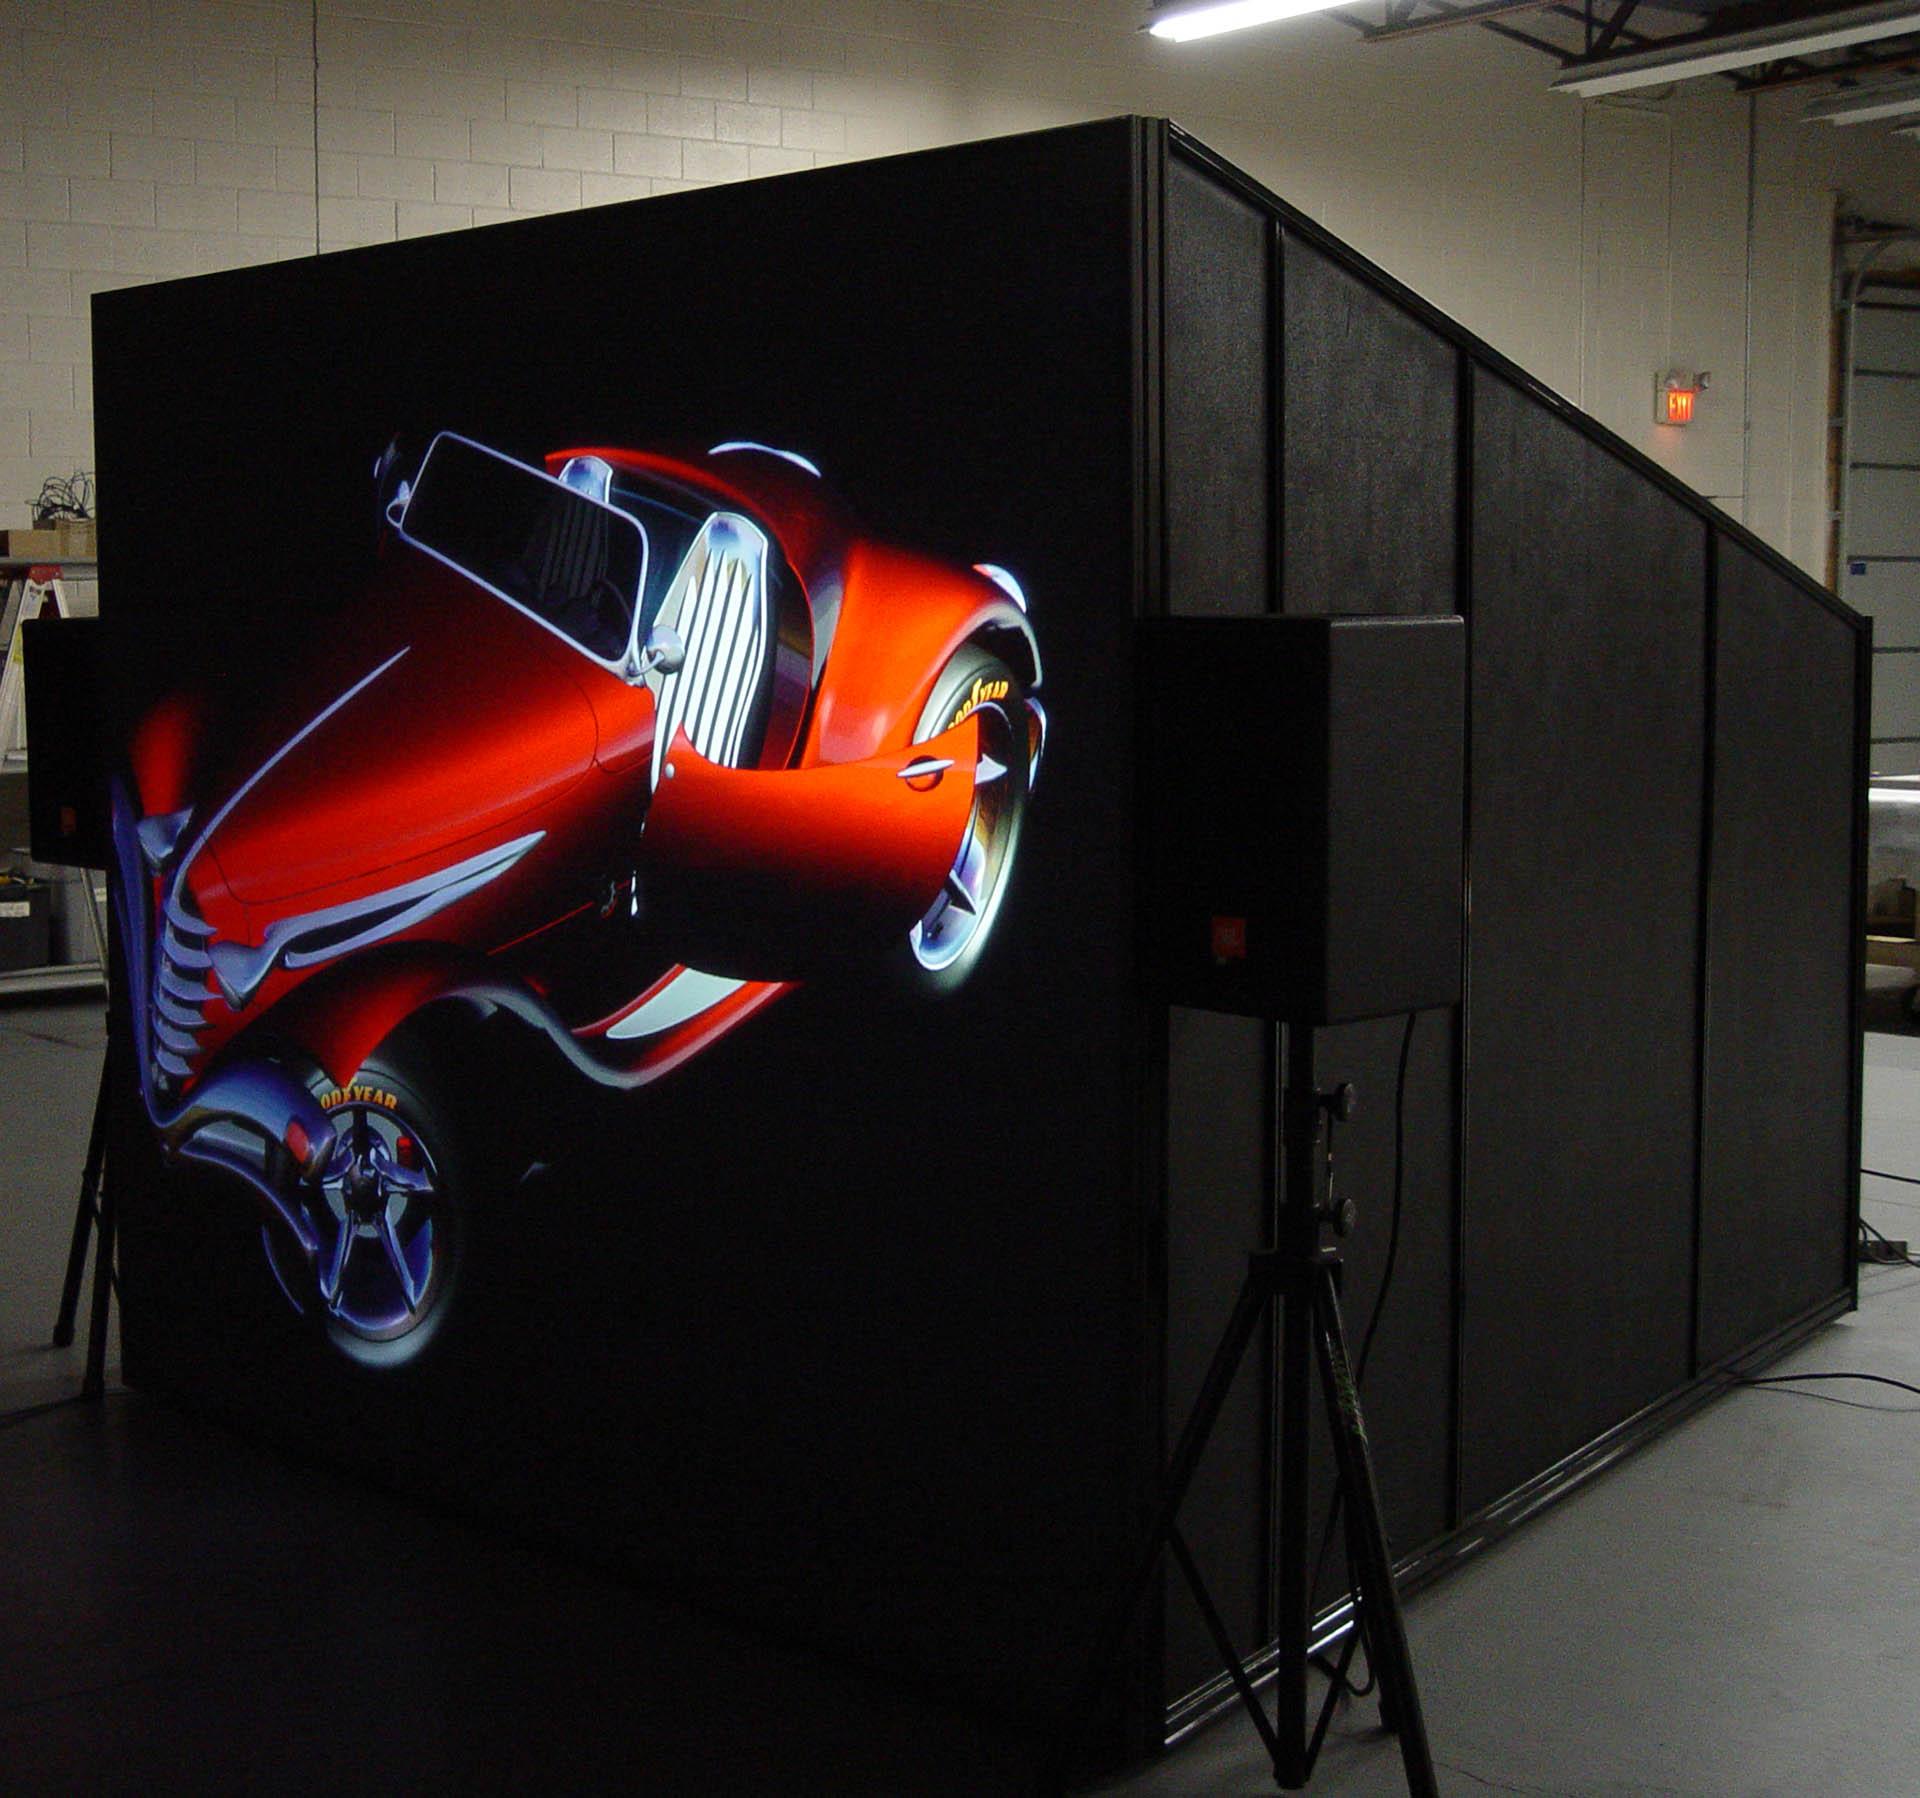 IGI powerwindow high definition 4K projection vintage auto